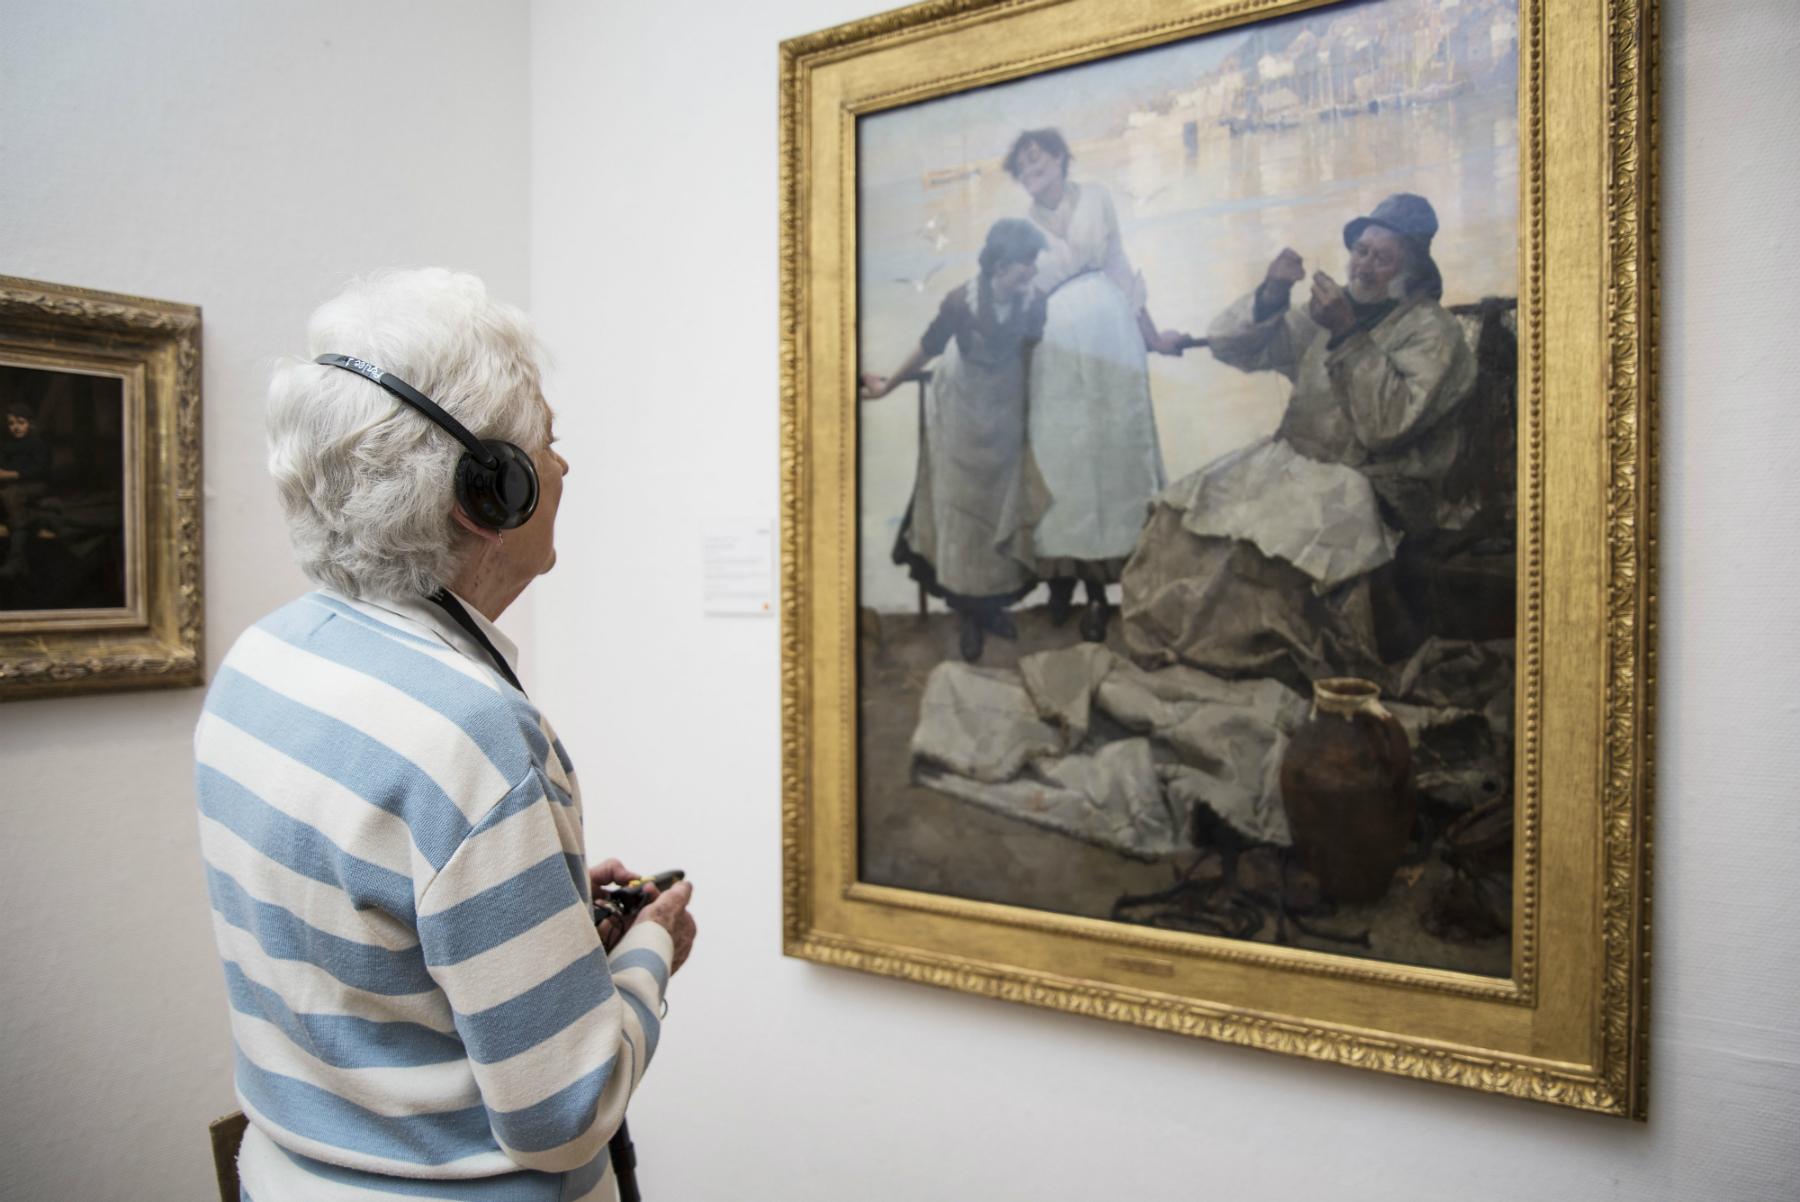 Grey-haired woman views painting, wearing headphones